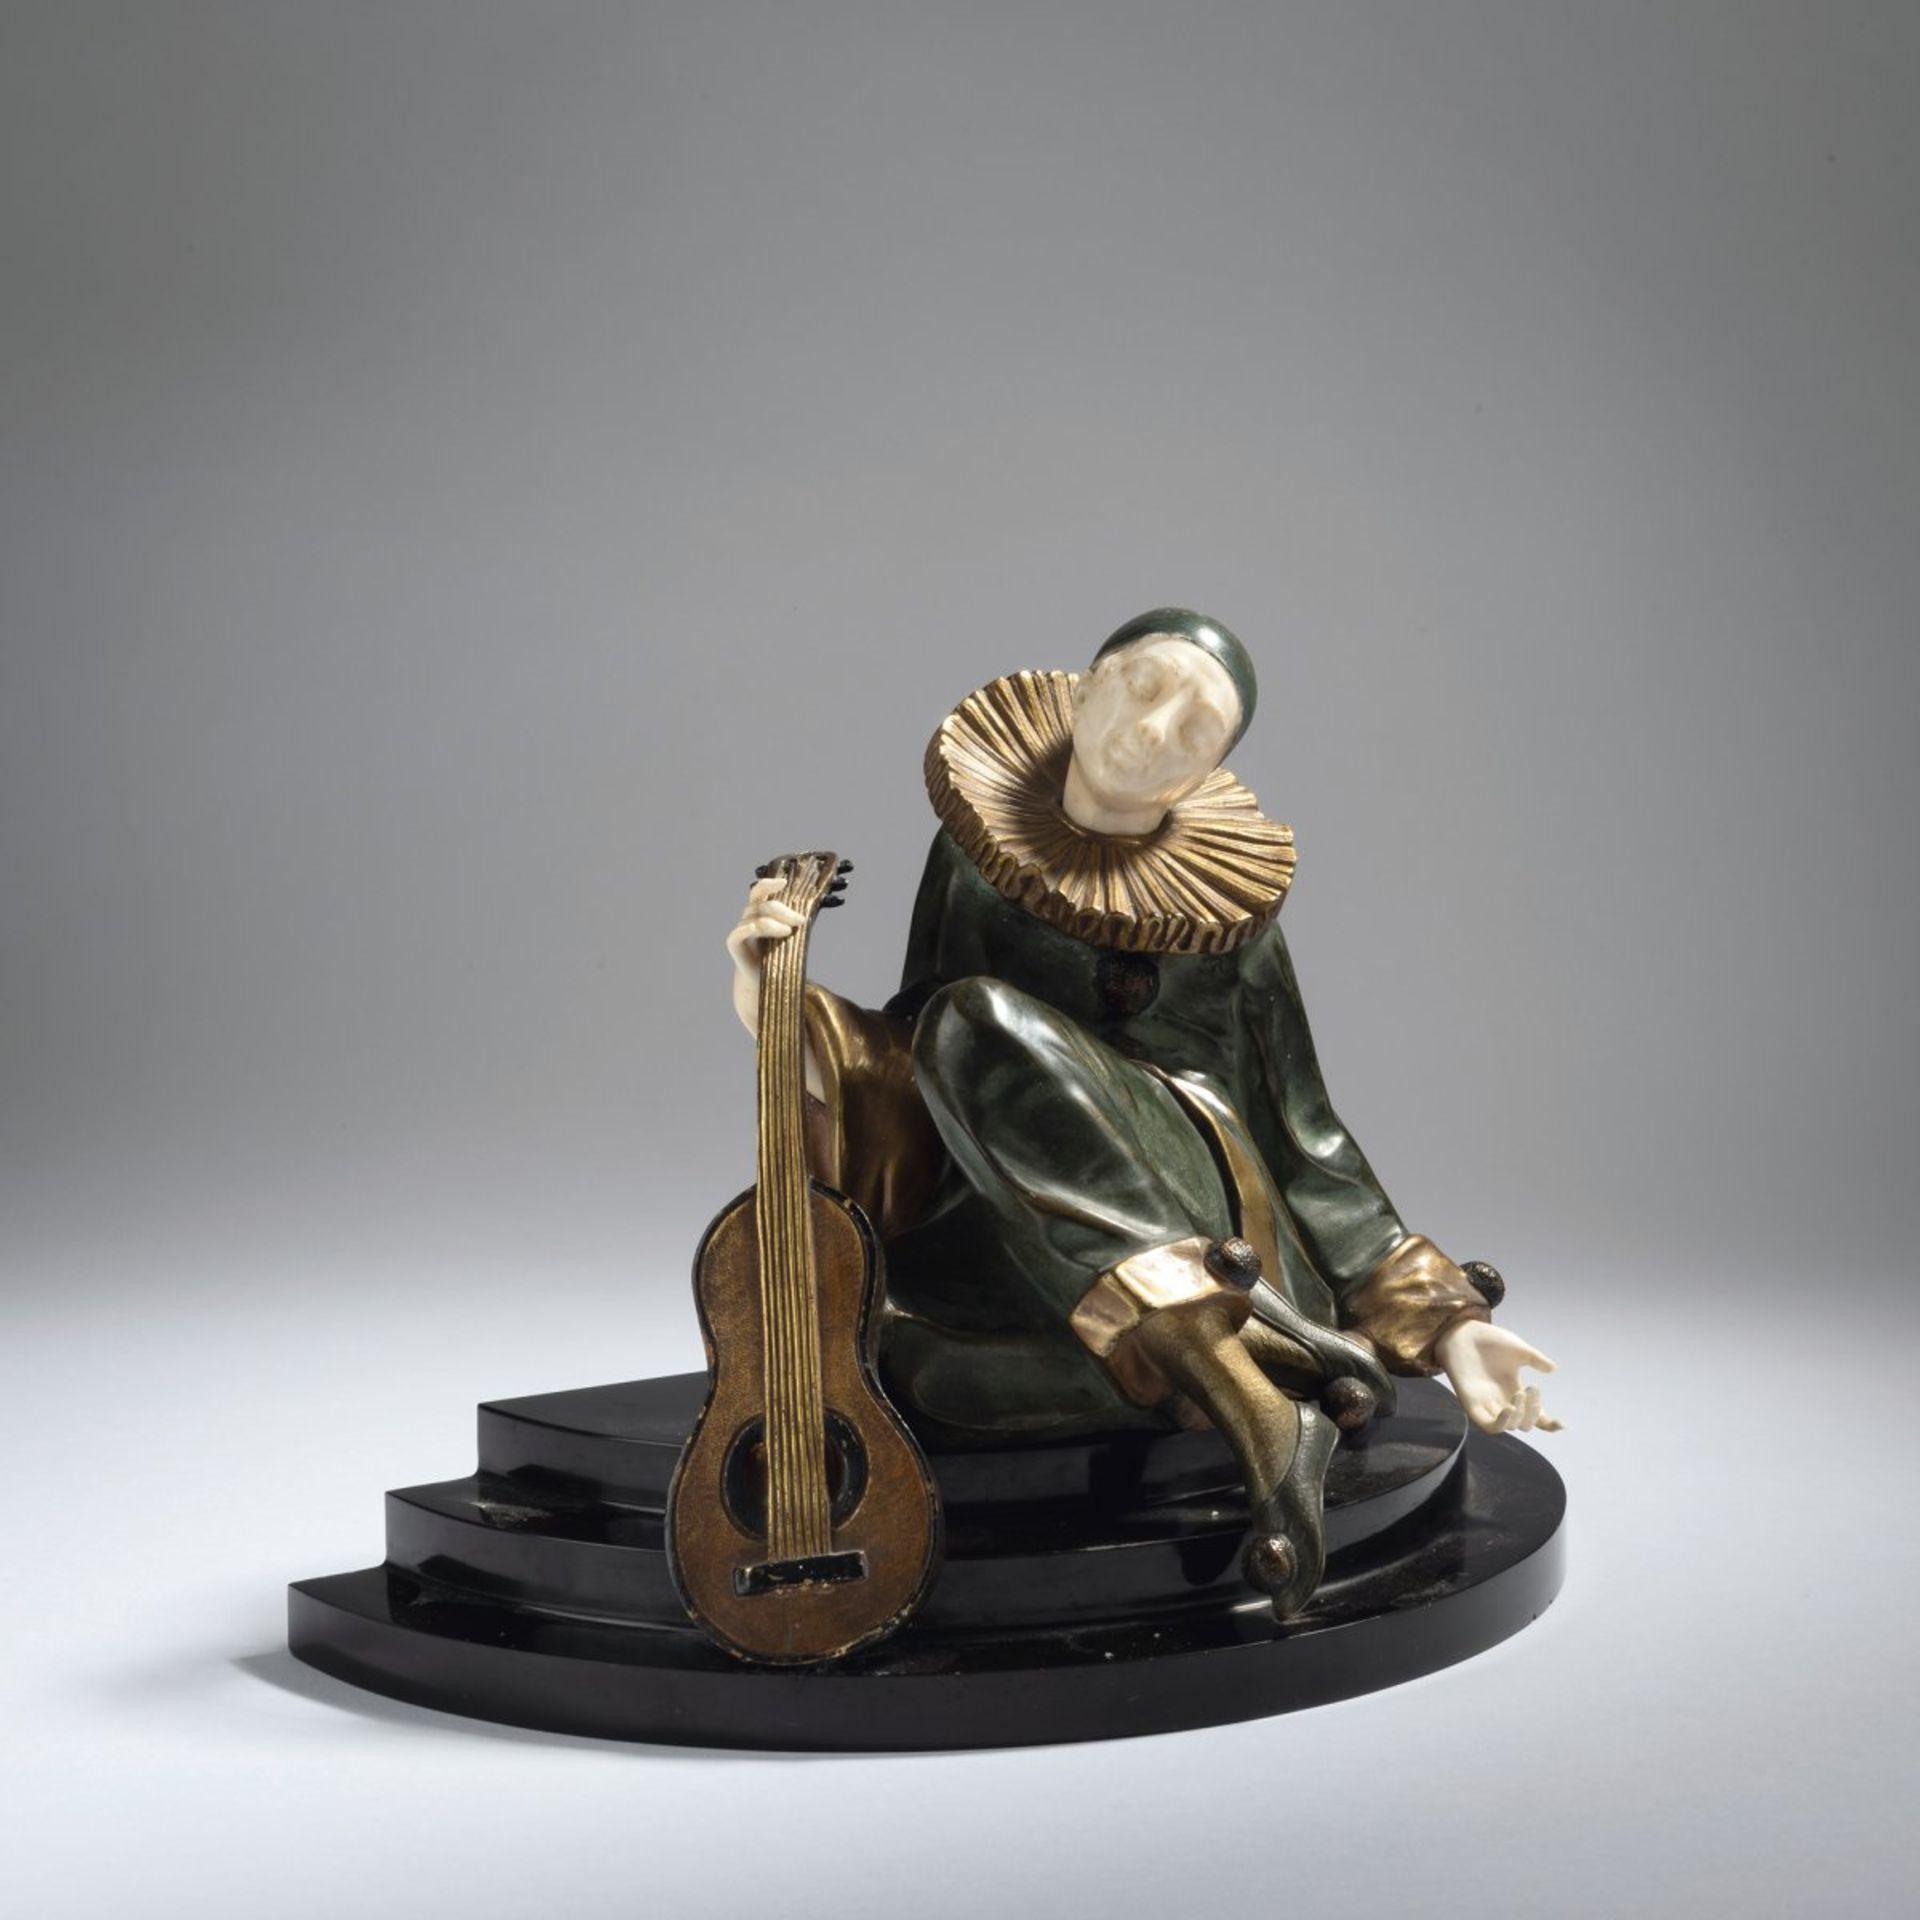 Alfred Gilbert, Pierrot mit Gitarre, 1925